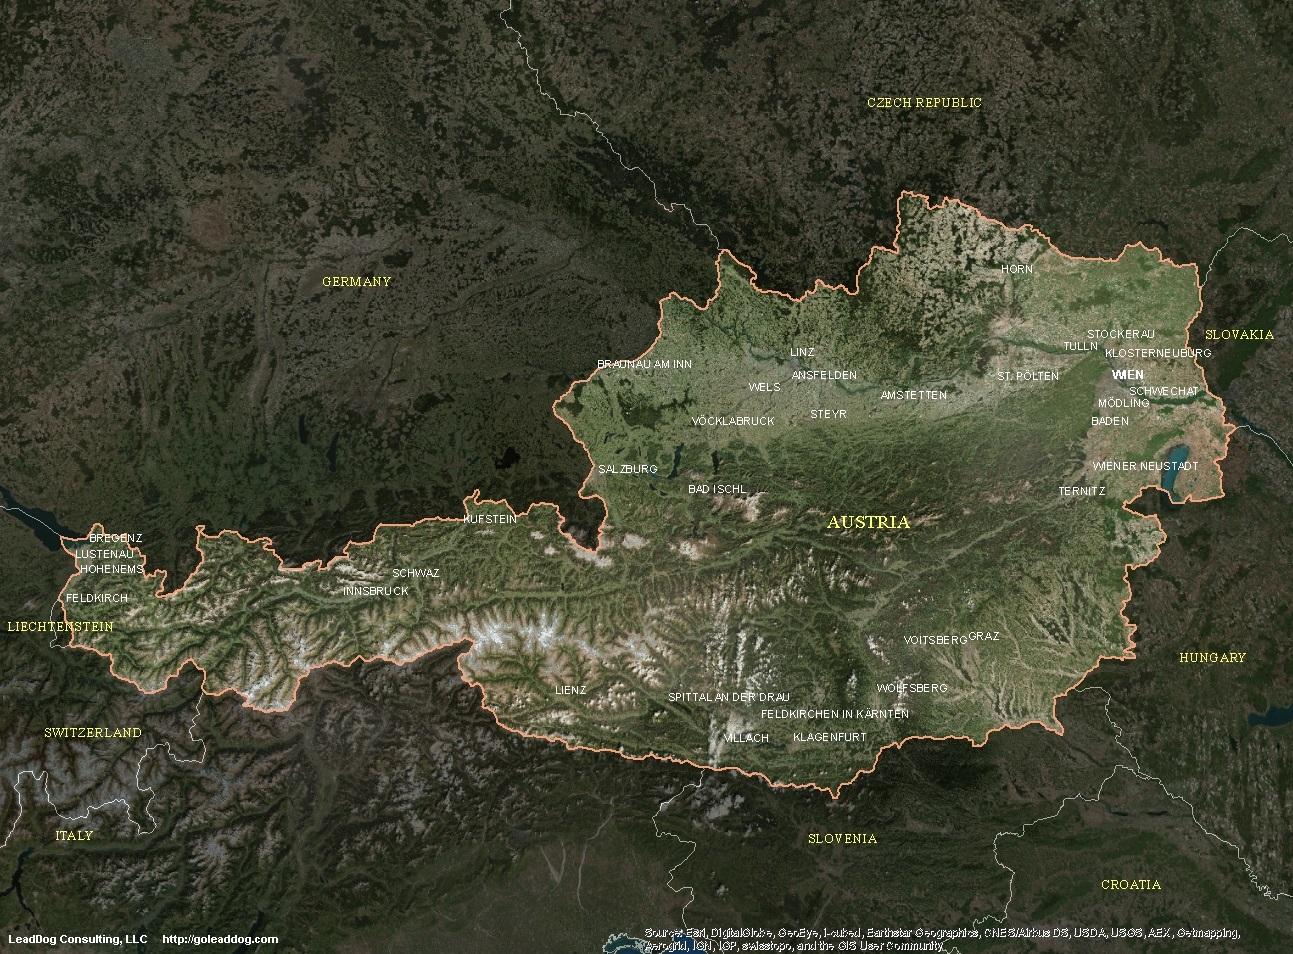 Austria Satellite Maps | LeadDog Consulting on satellite map of saipan, satellite map of mali, satellite map of vatican city, satellite map of brunei darussalam, satellite map of prague, satellite map of abu dhabi, satellite map of the gambia, satellite map of montserrat, satellite map of caribbean islands, satellite map of the vatican, satellite map of mauritania, satellite map of iraq, satellite map of united states of america, satellite map of tunisia, satellite map of kosovo, satellite map of western europe, satellite map of qatar, satellite map of uzbekistan, satellite map of trinidad and tobago, satellite map of somalia,